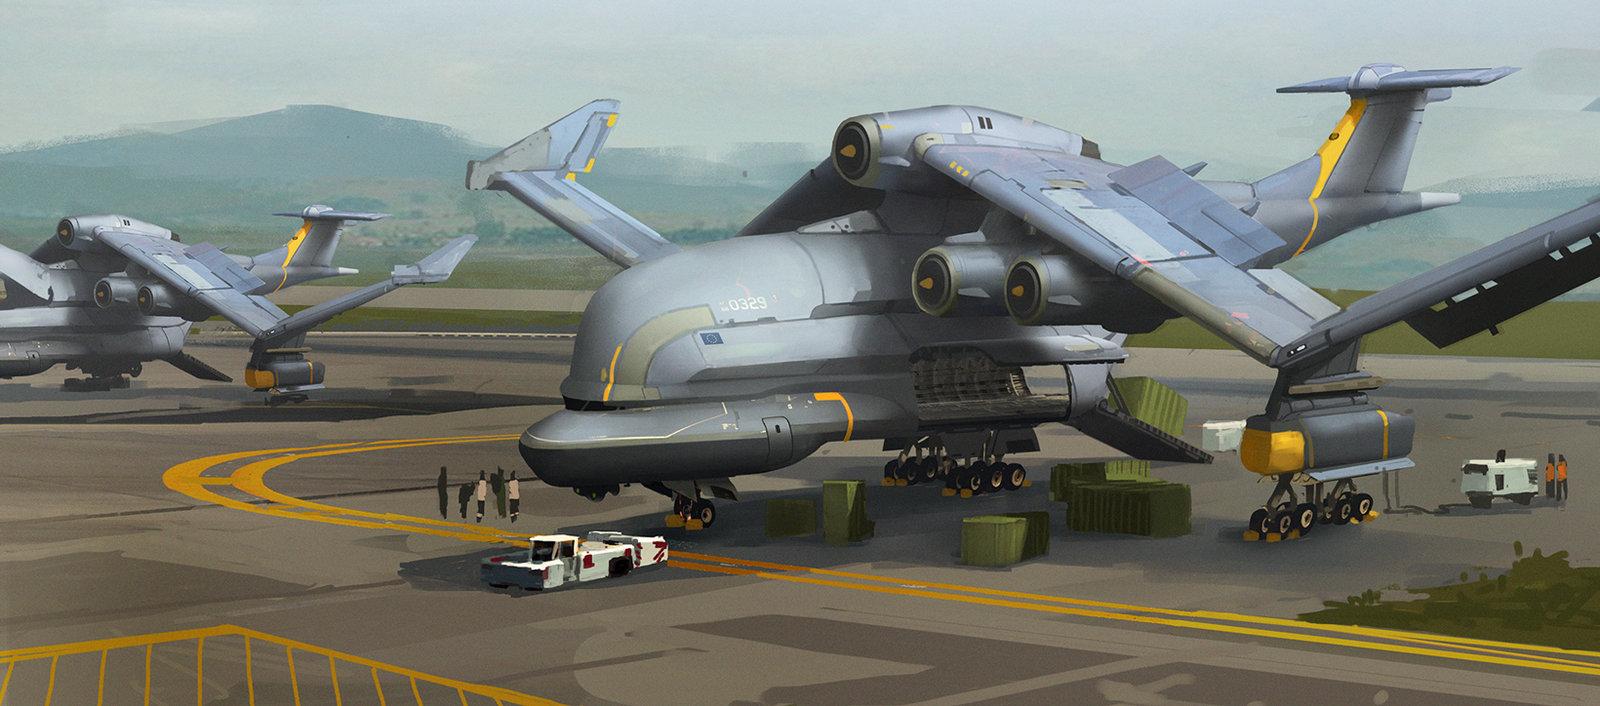 Drawn airplane cargo plane #2